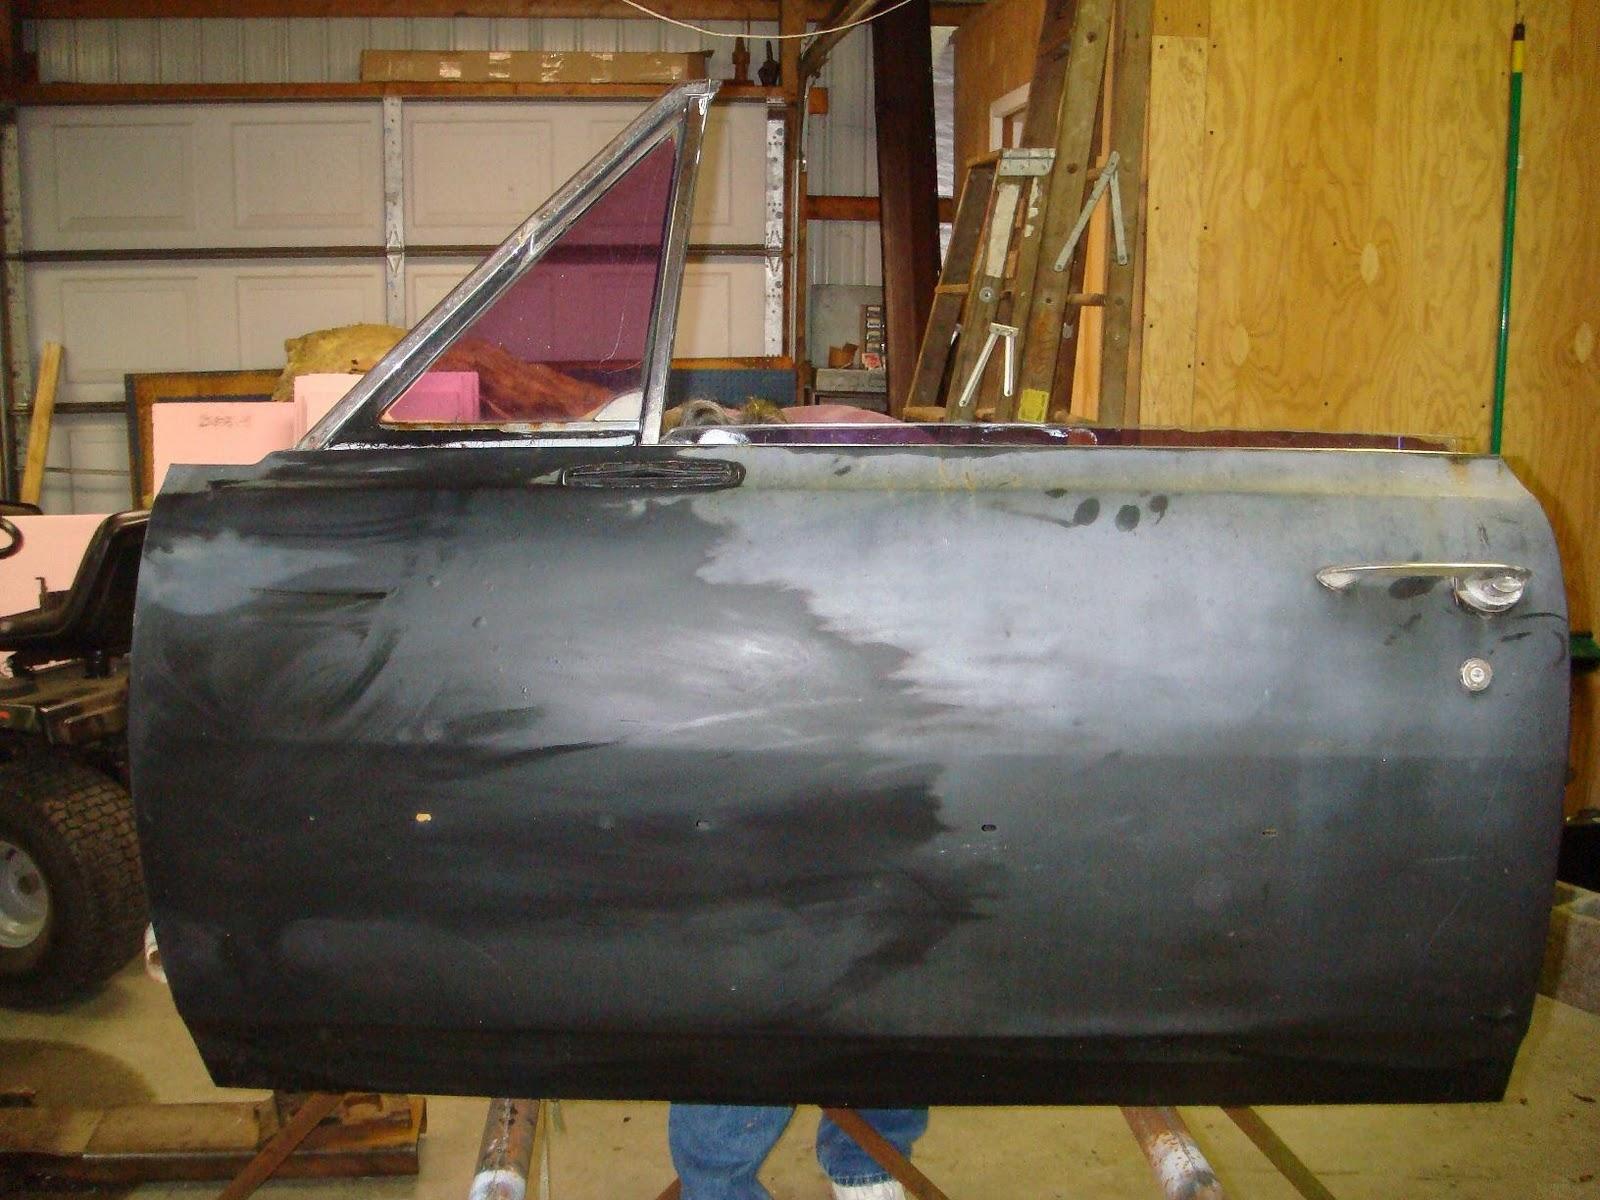 1965 Chevelle Parts Image Amseek search